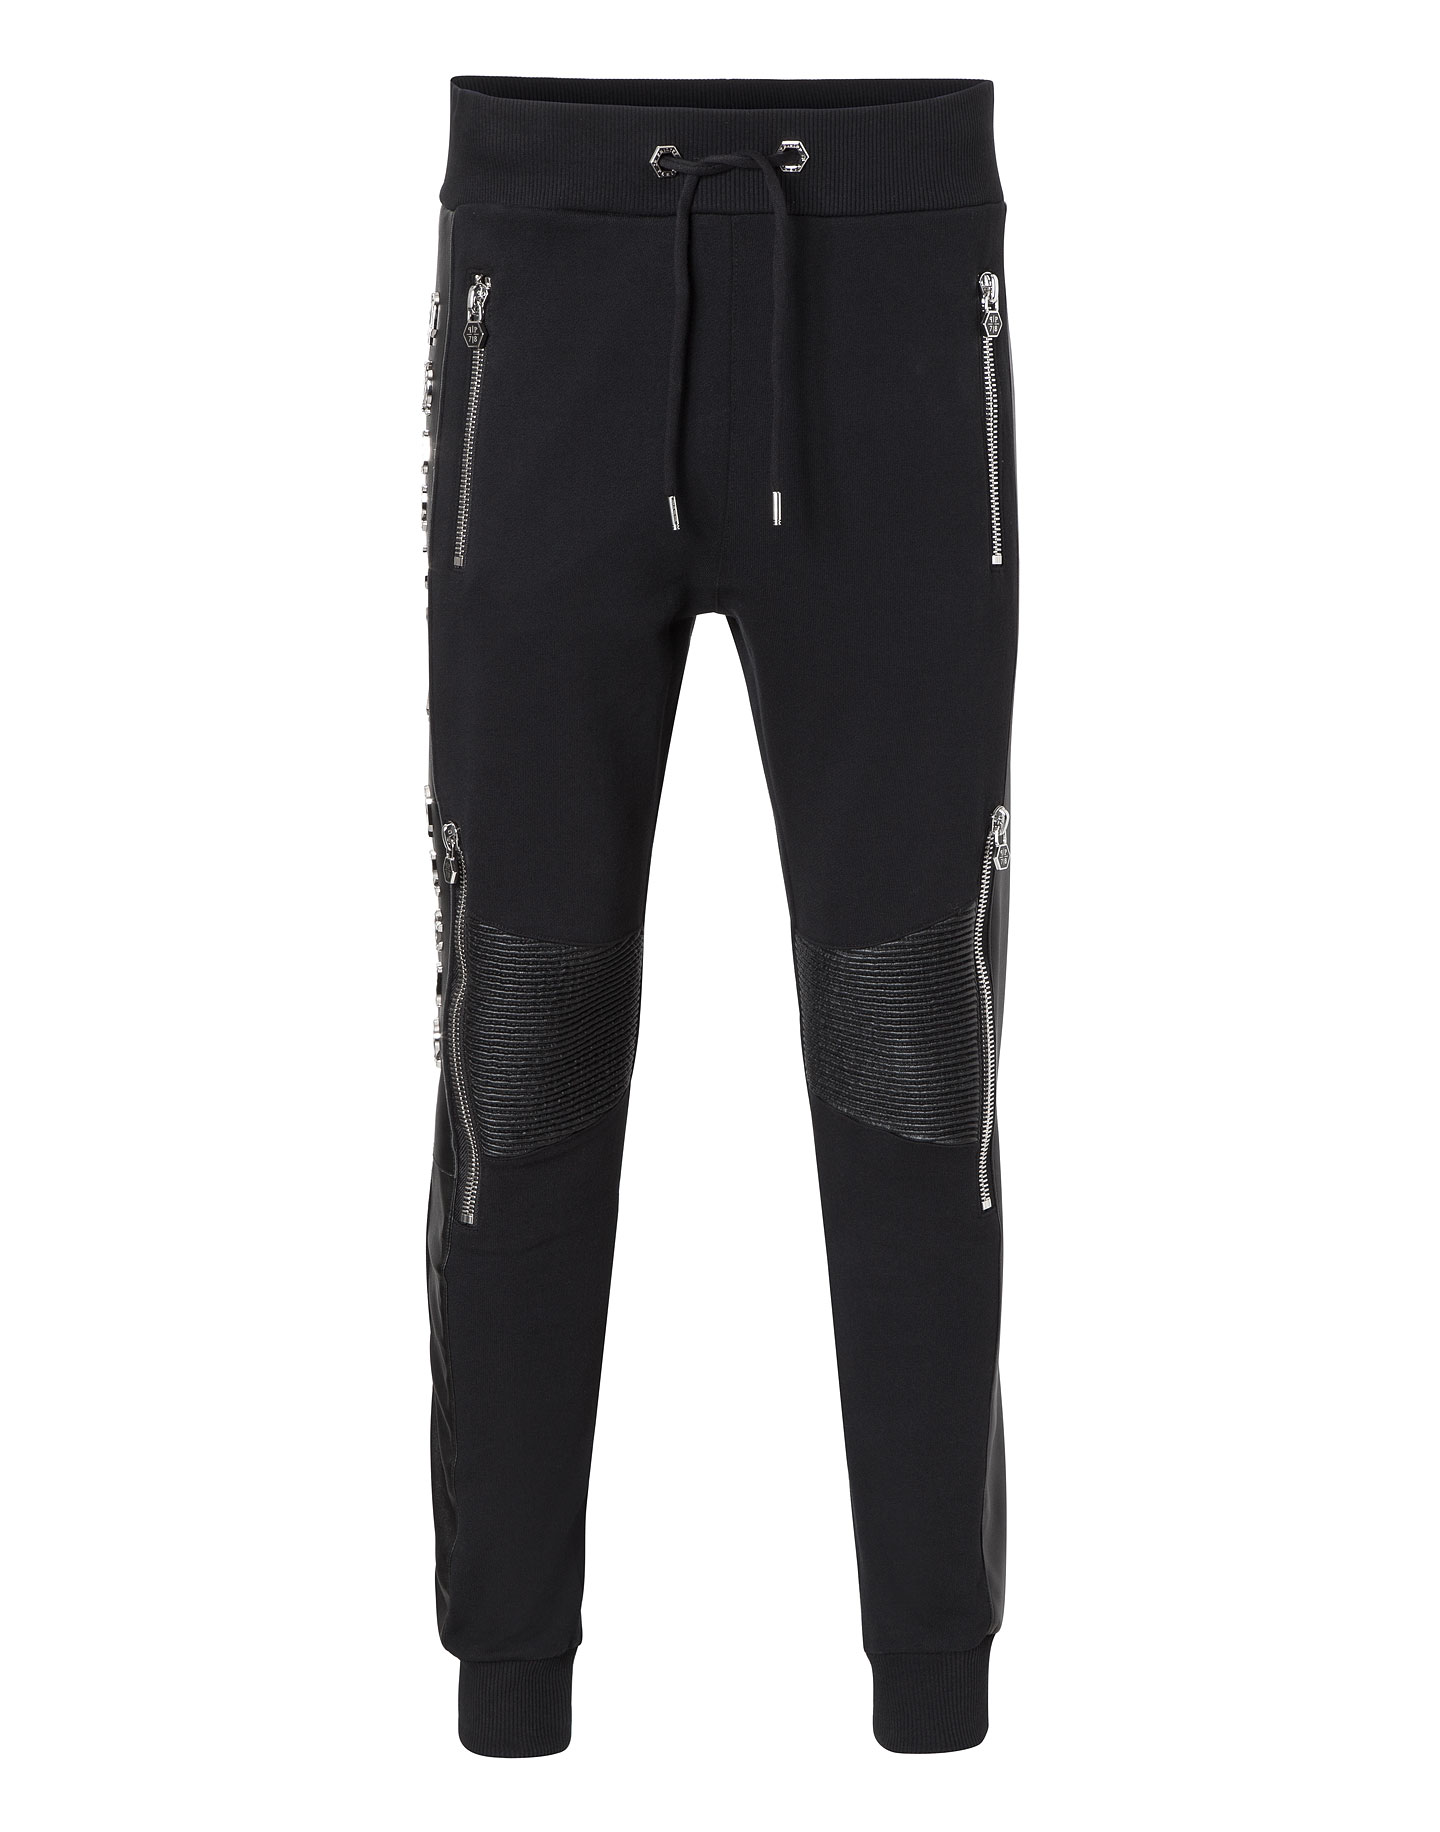 b44170c1b1 Jogging Trousers